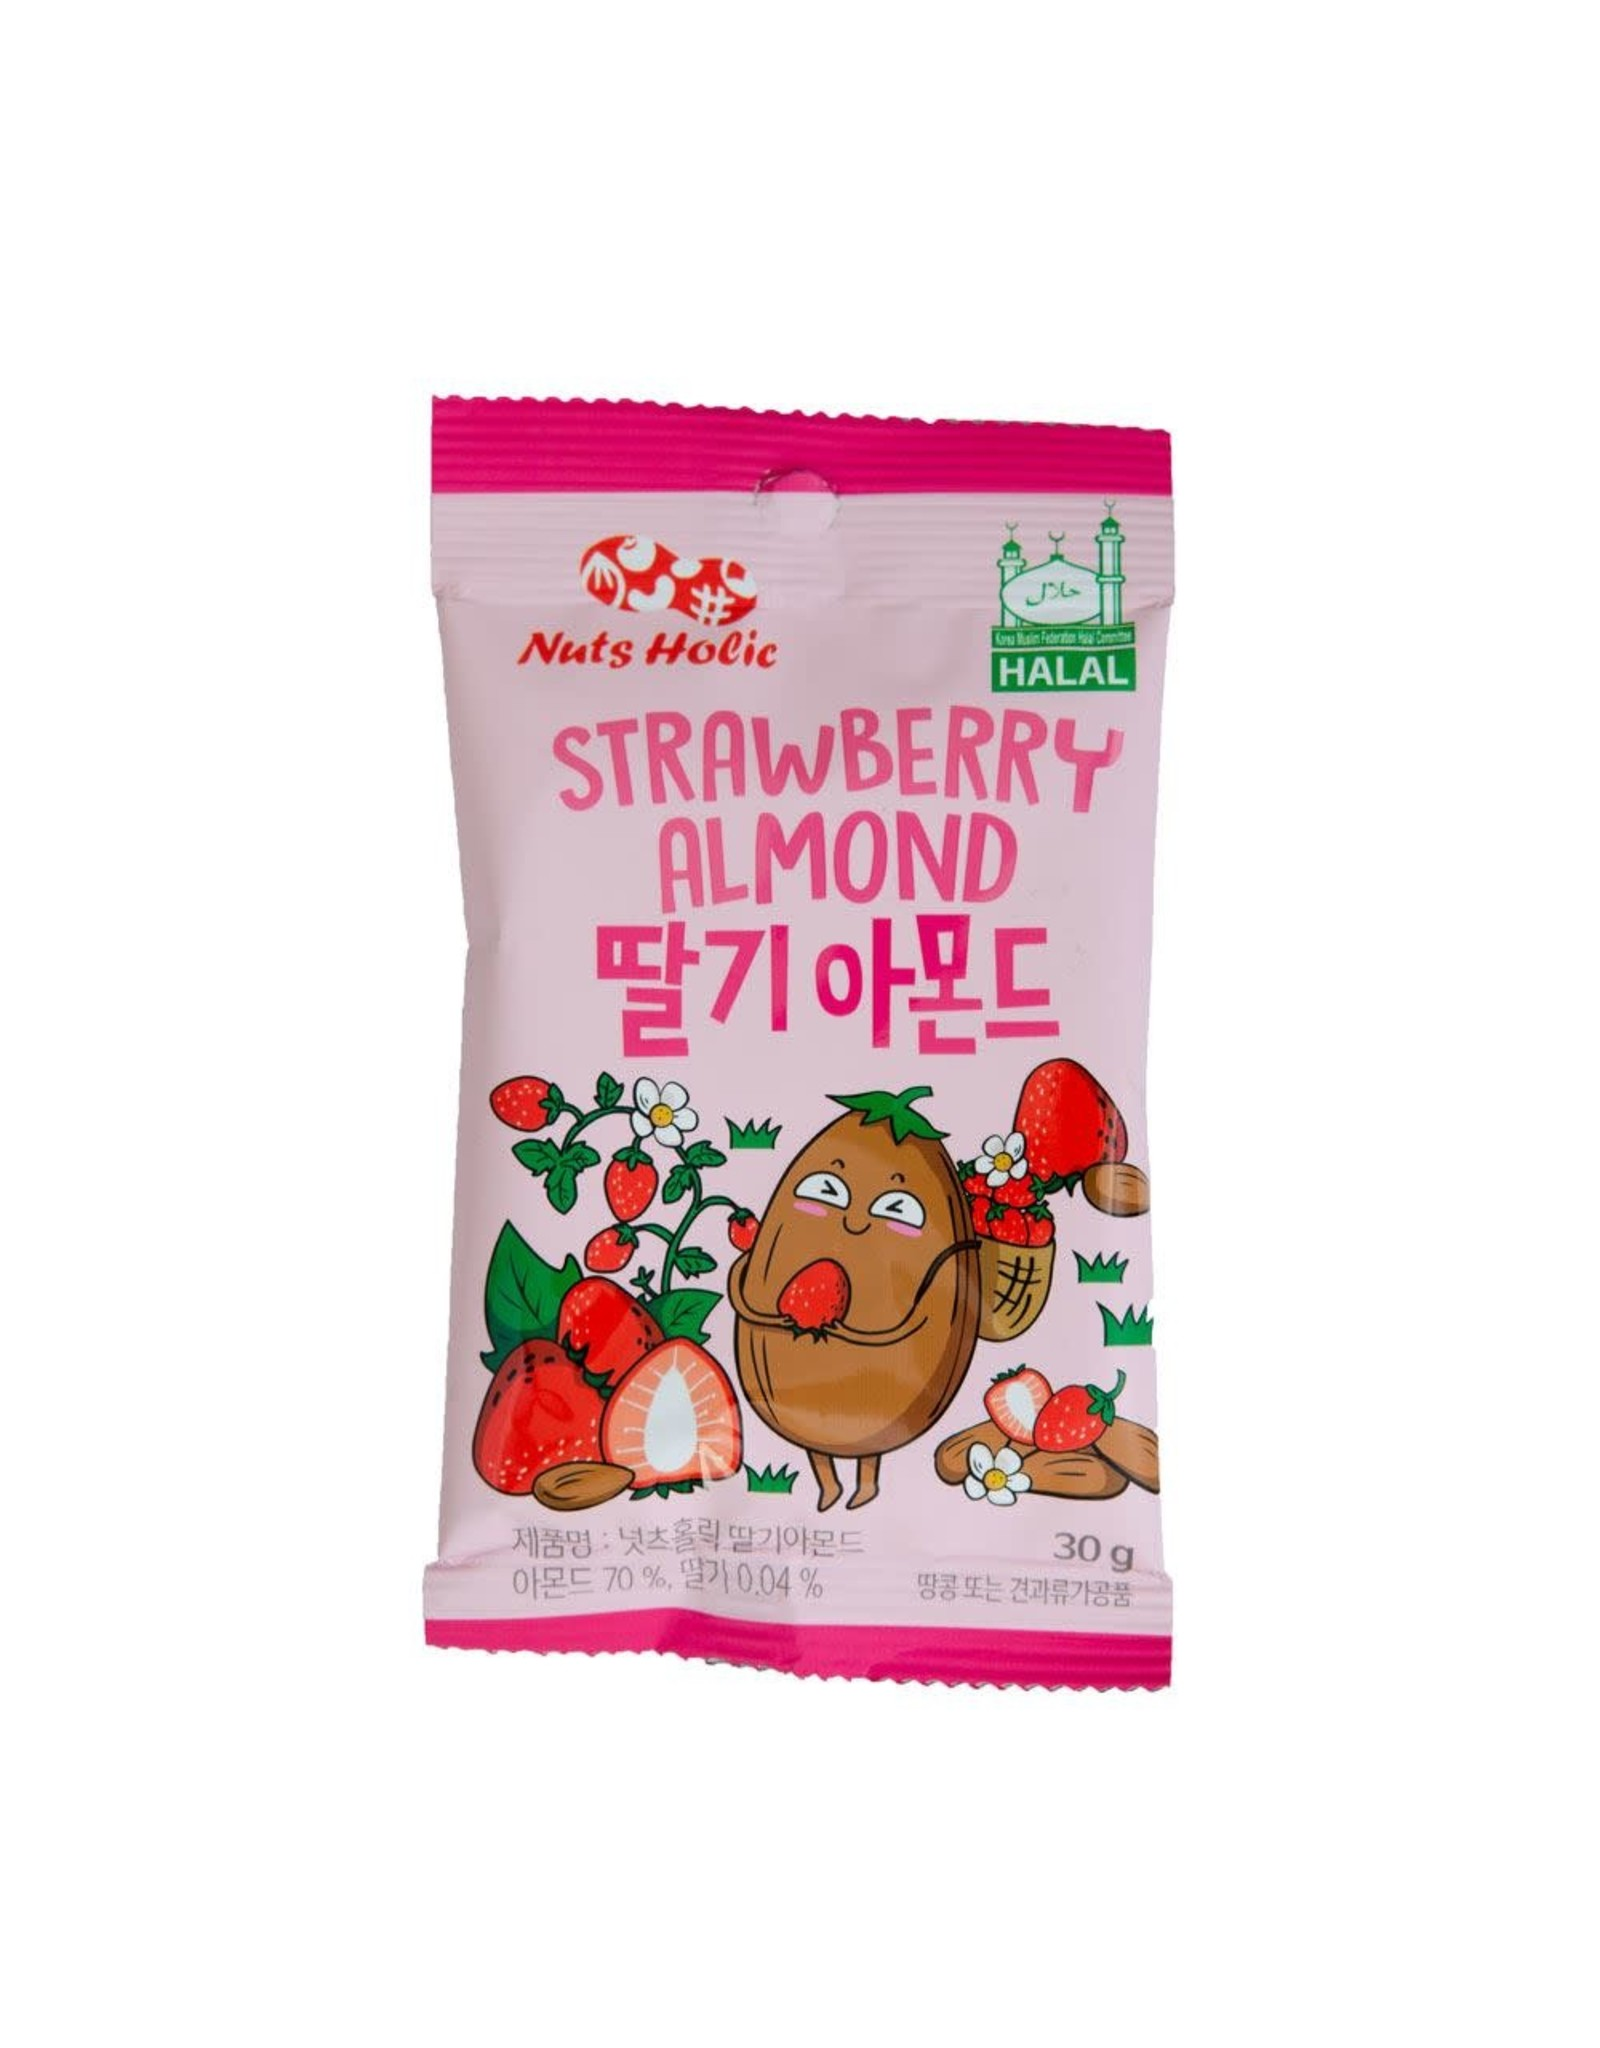 NutsHolic - Strawberry Almonds - 30g